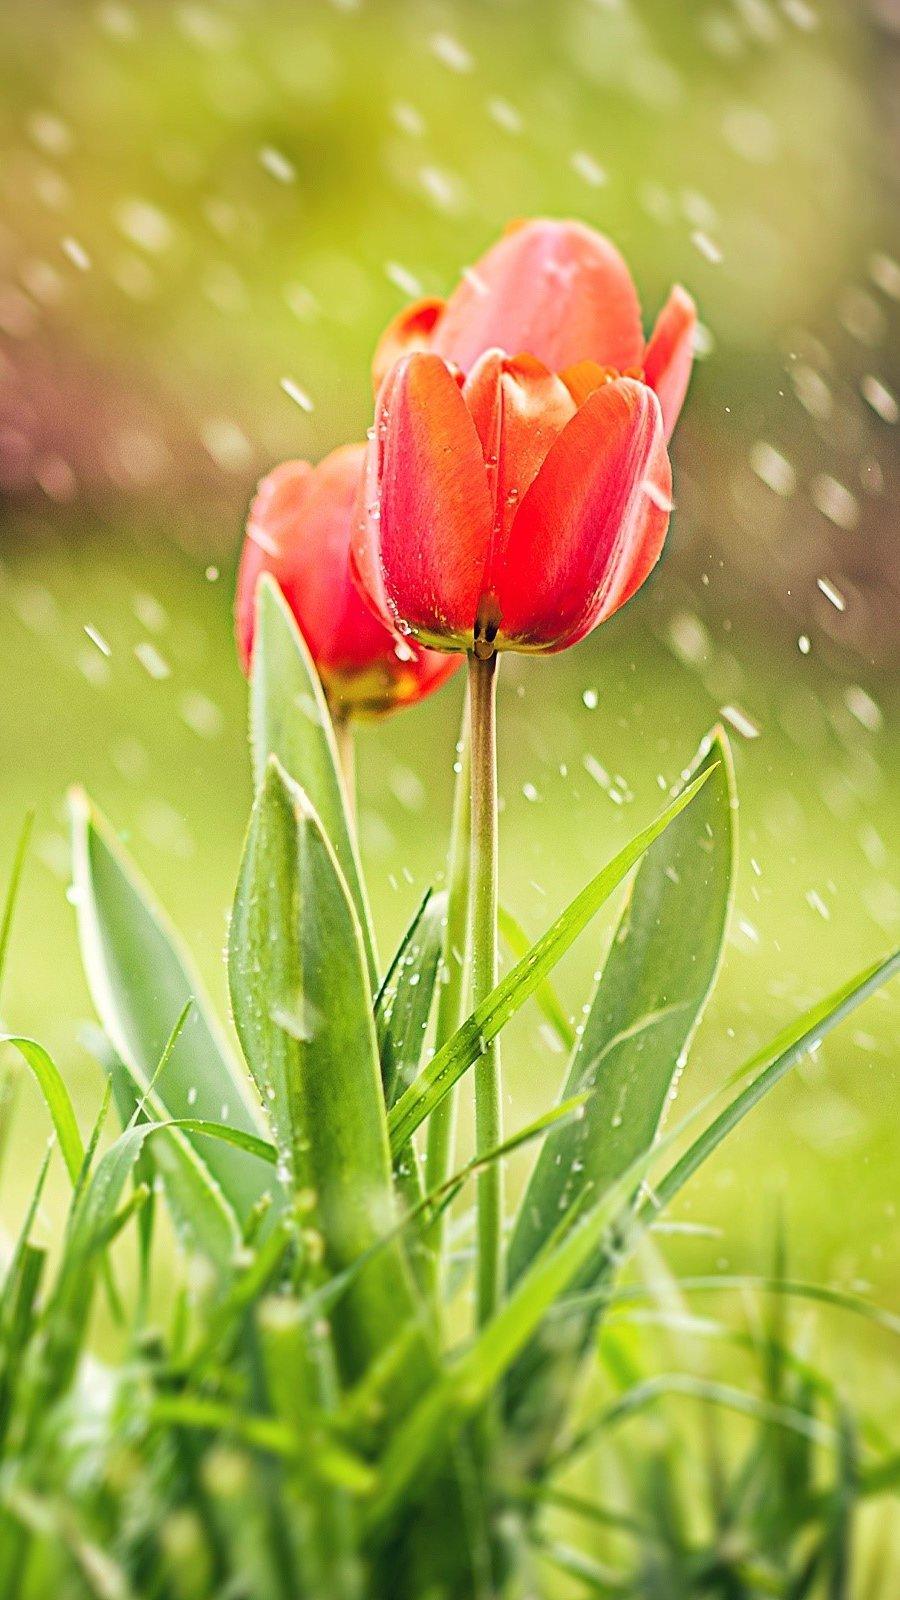 Wallpaper Tulips in the rain Vertical